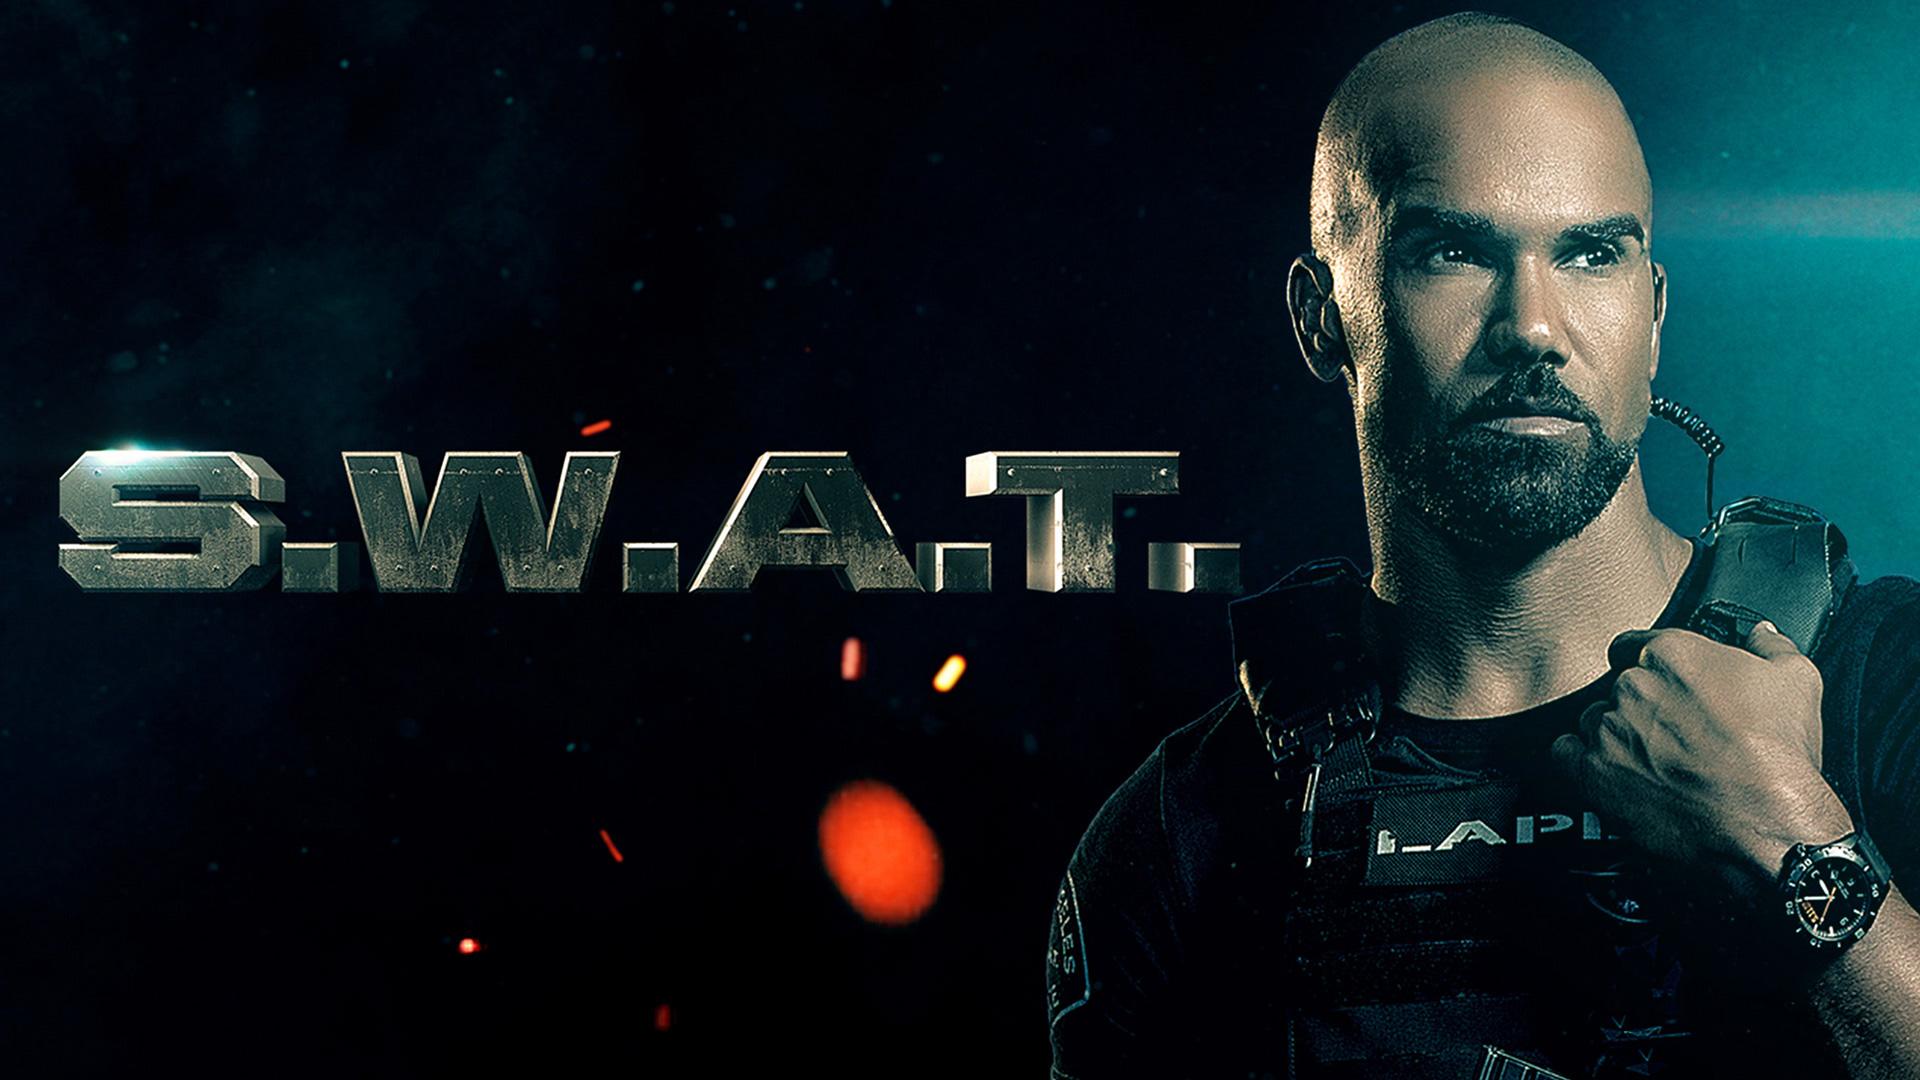 S.W.A.T. (2017) - Staffel 1 [dt./OV]